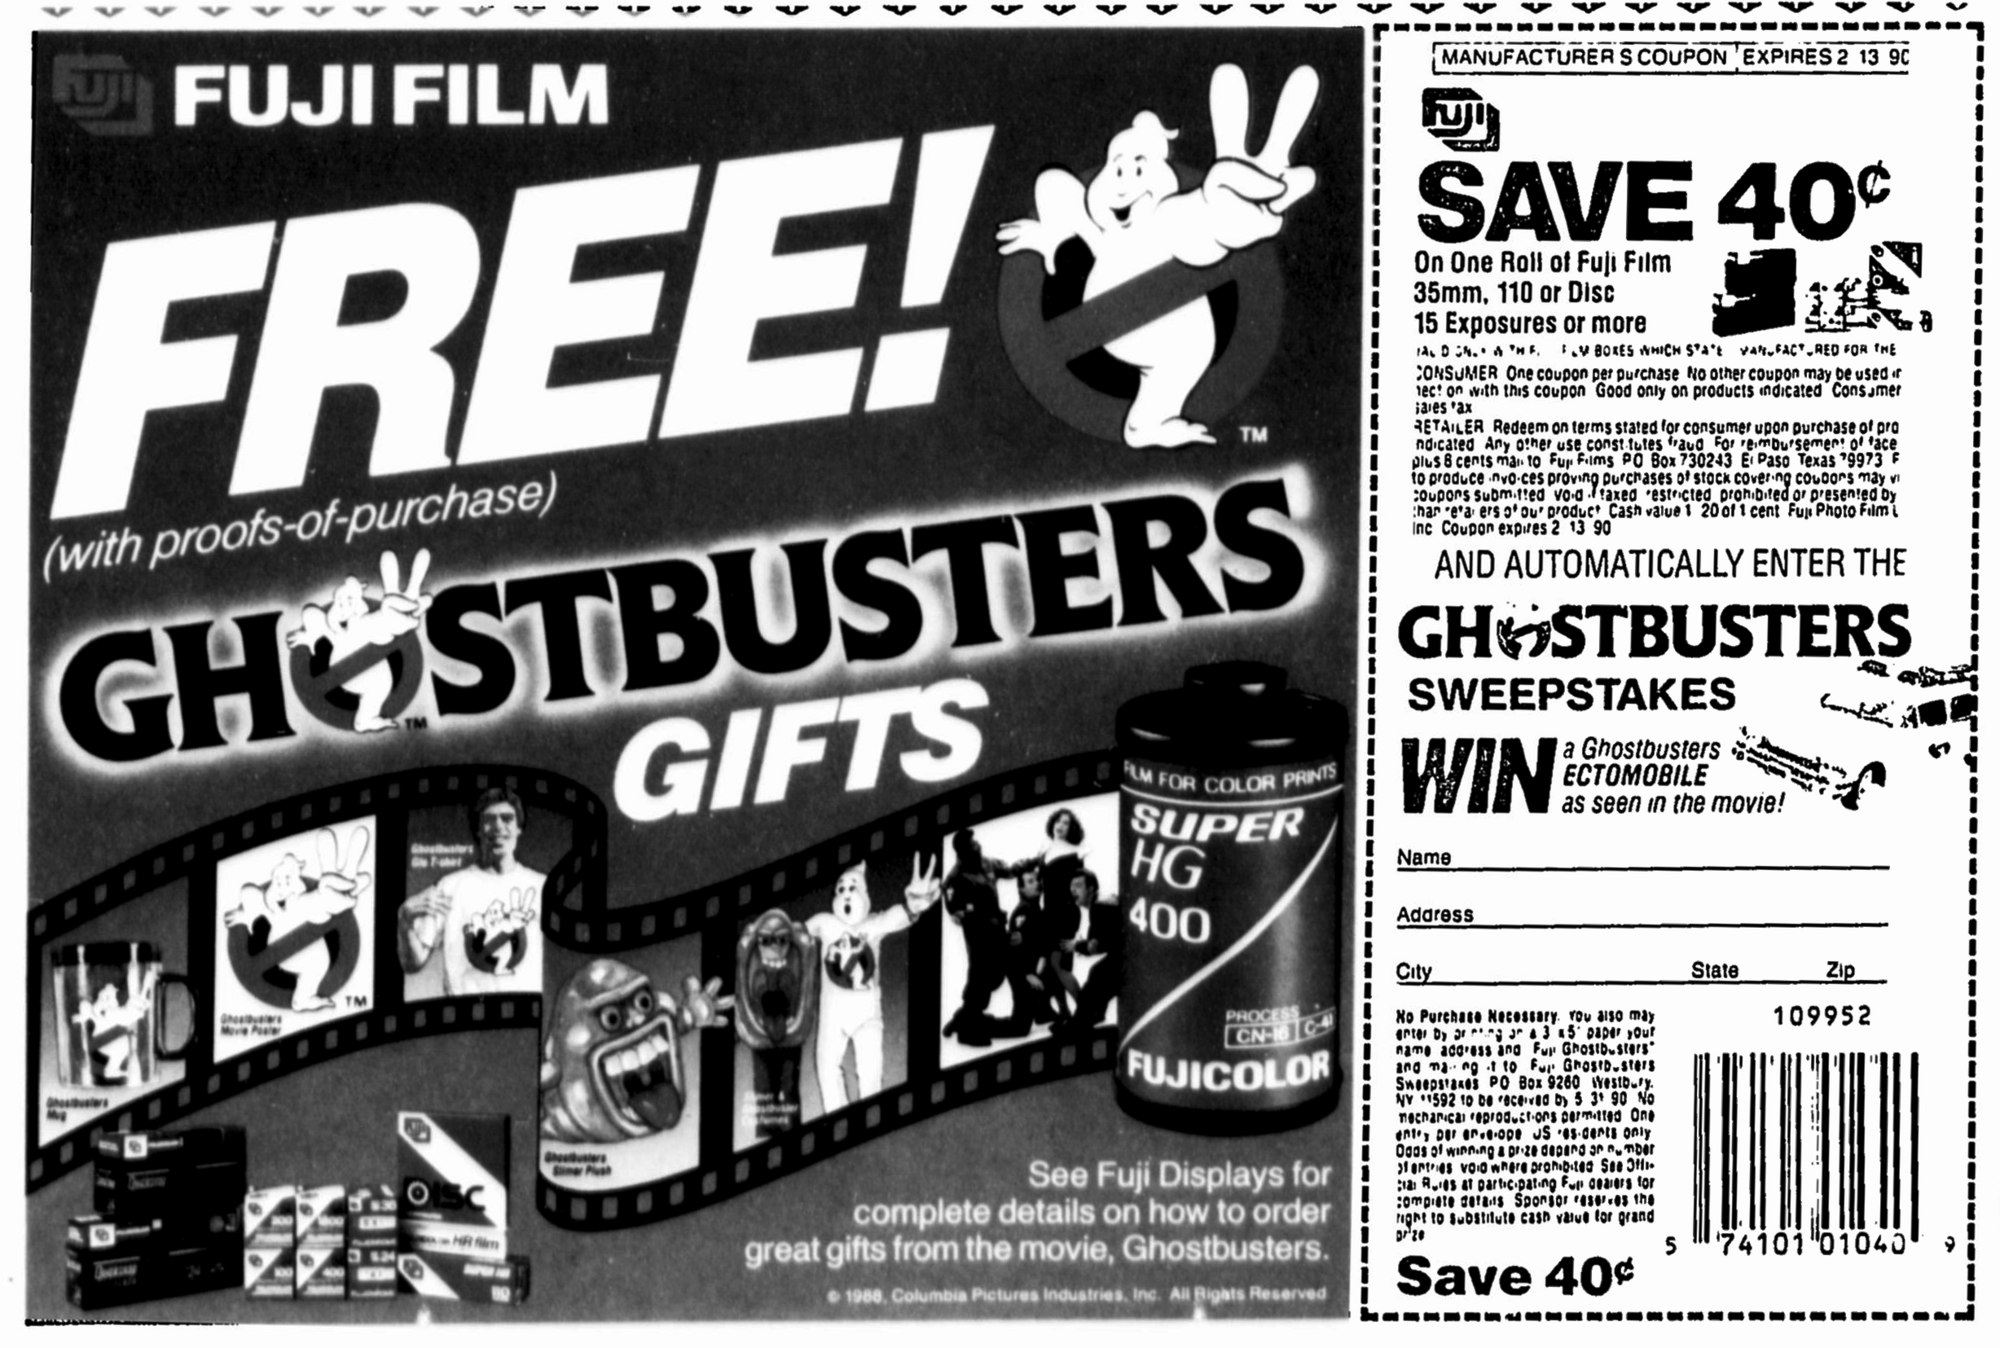 Film's PromotionWiki Fandom Fuji Ii Ghostbusters xoBerdC